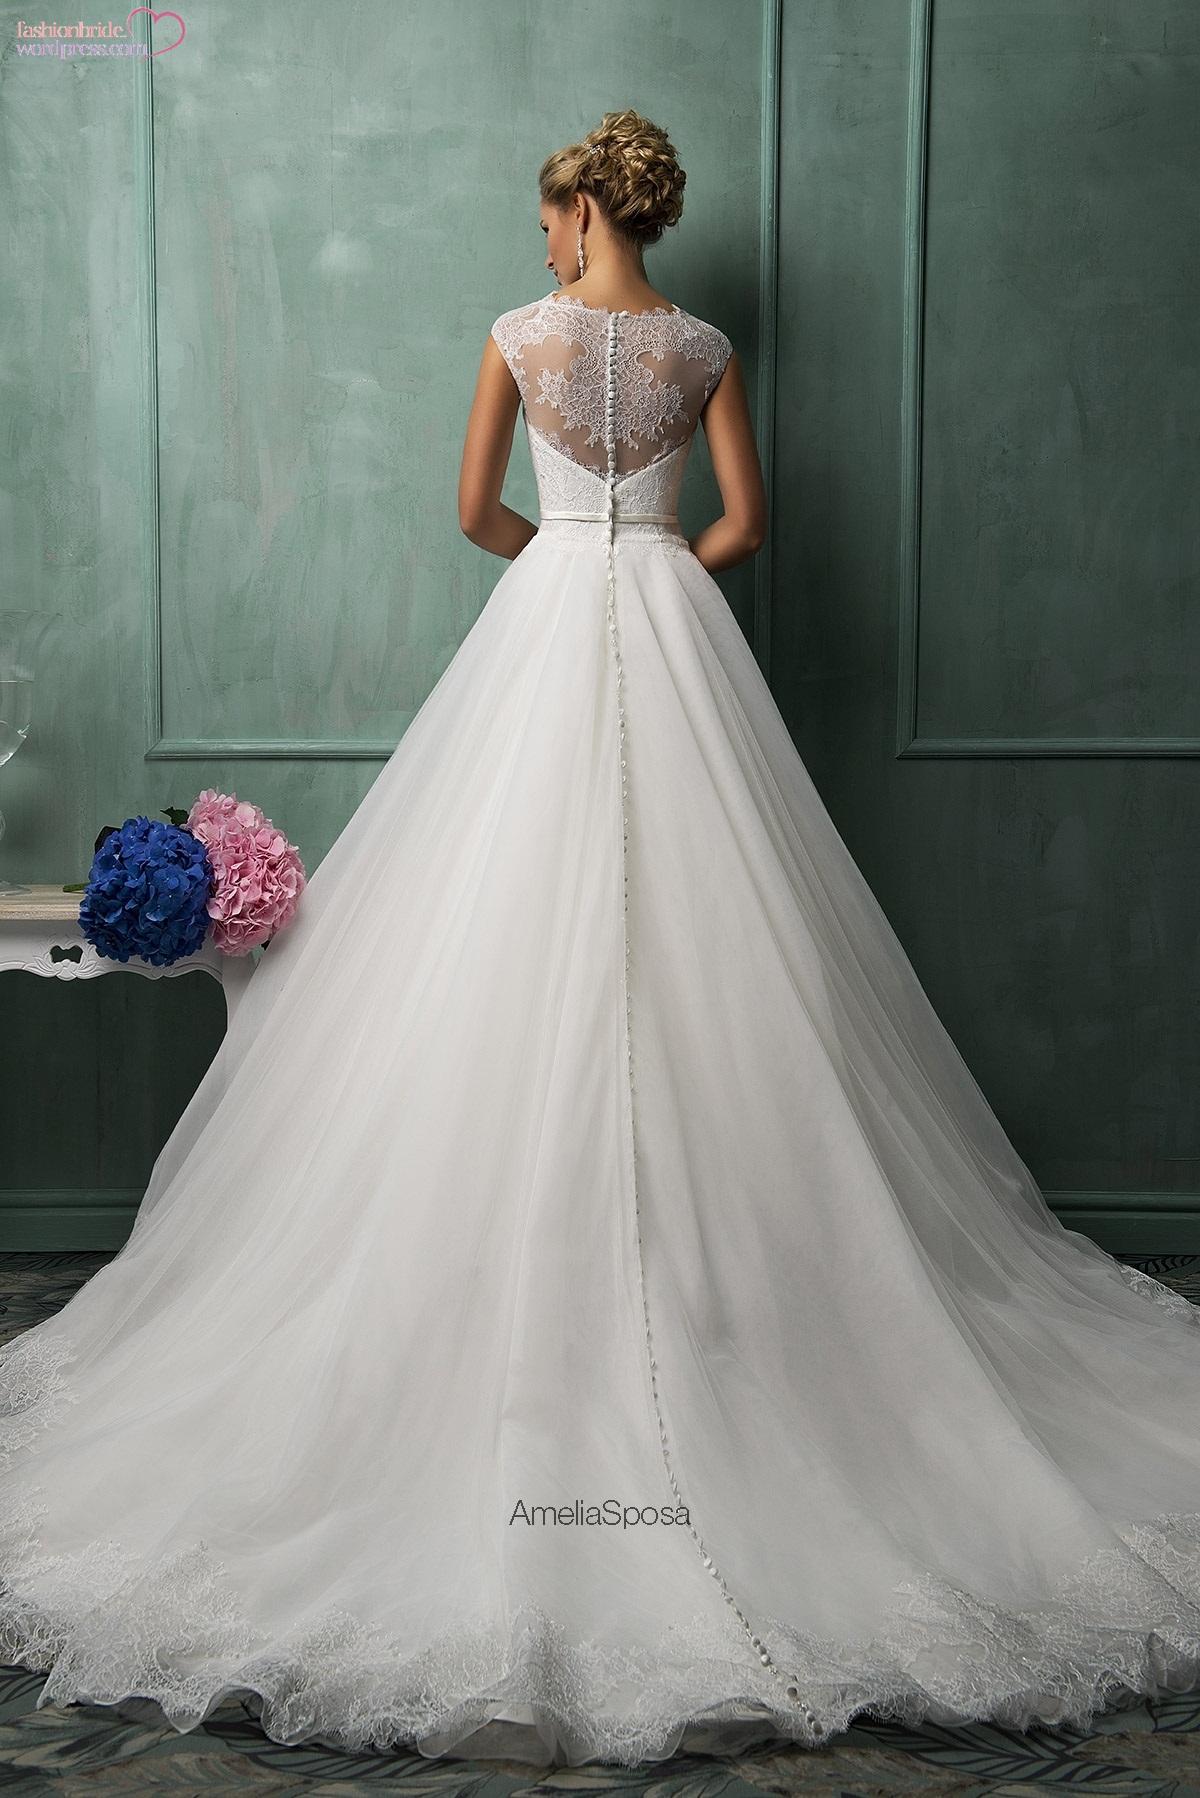 Amelia Sposa Spring 2014 Bridal Collection I